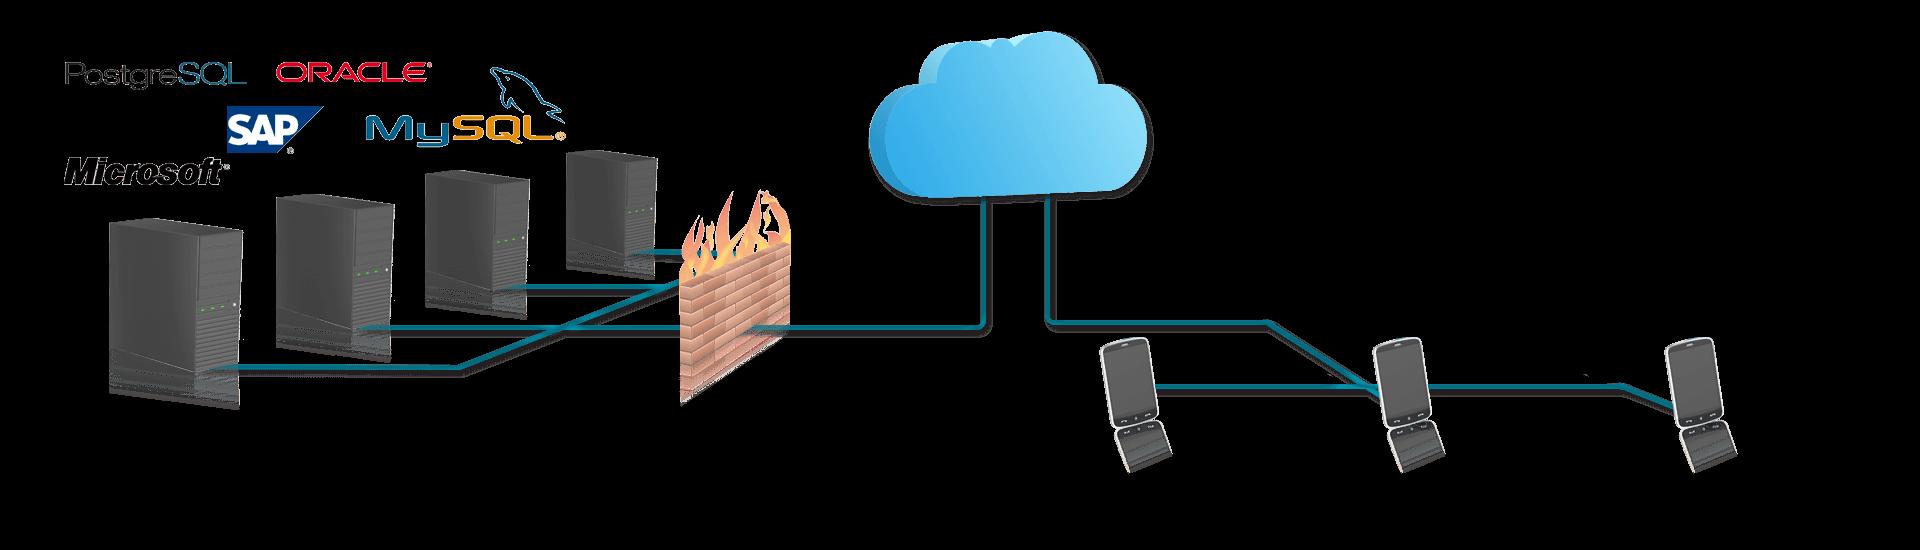 cloud based enterprise mobility architecture